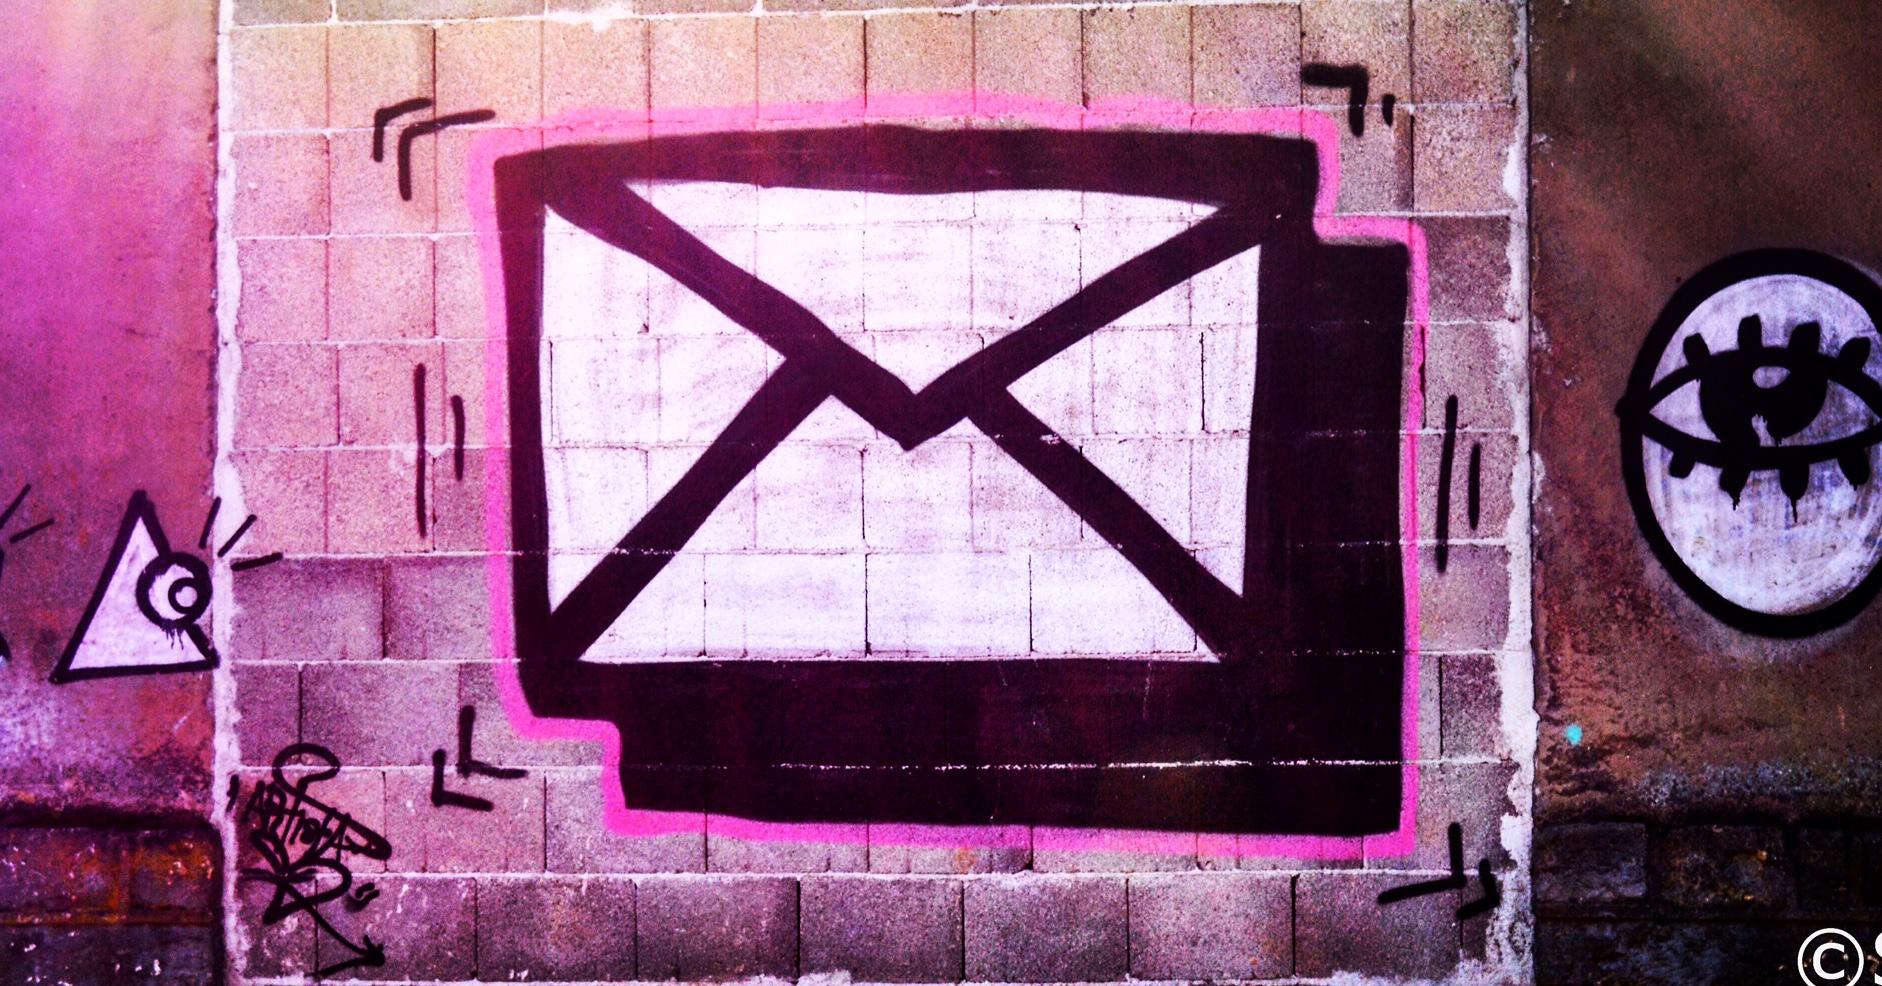 Letter Graffiti, Pfaffenthal